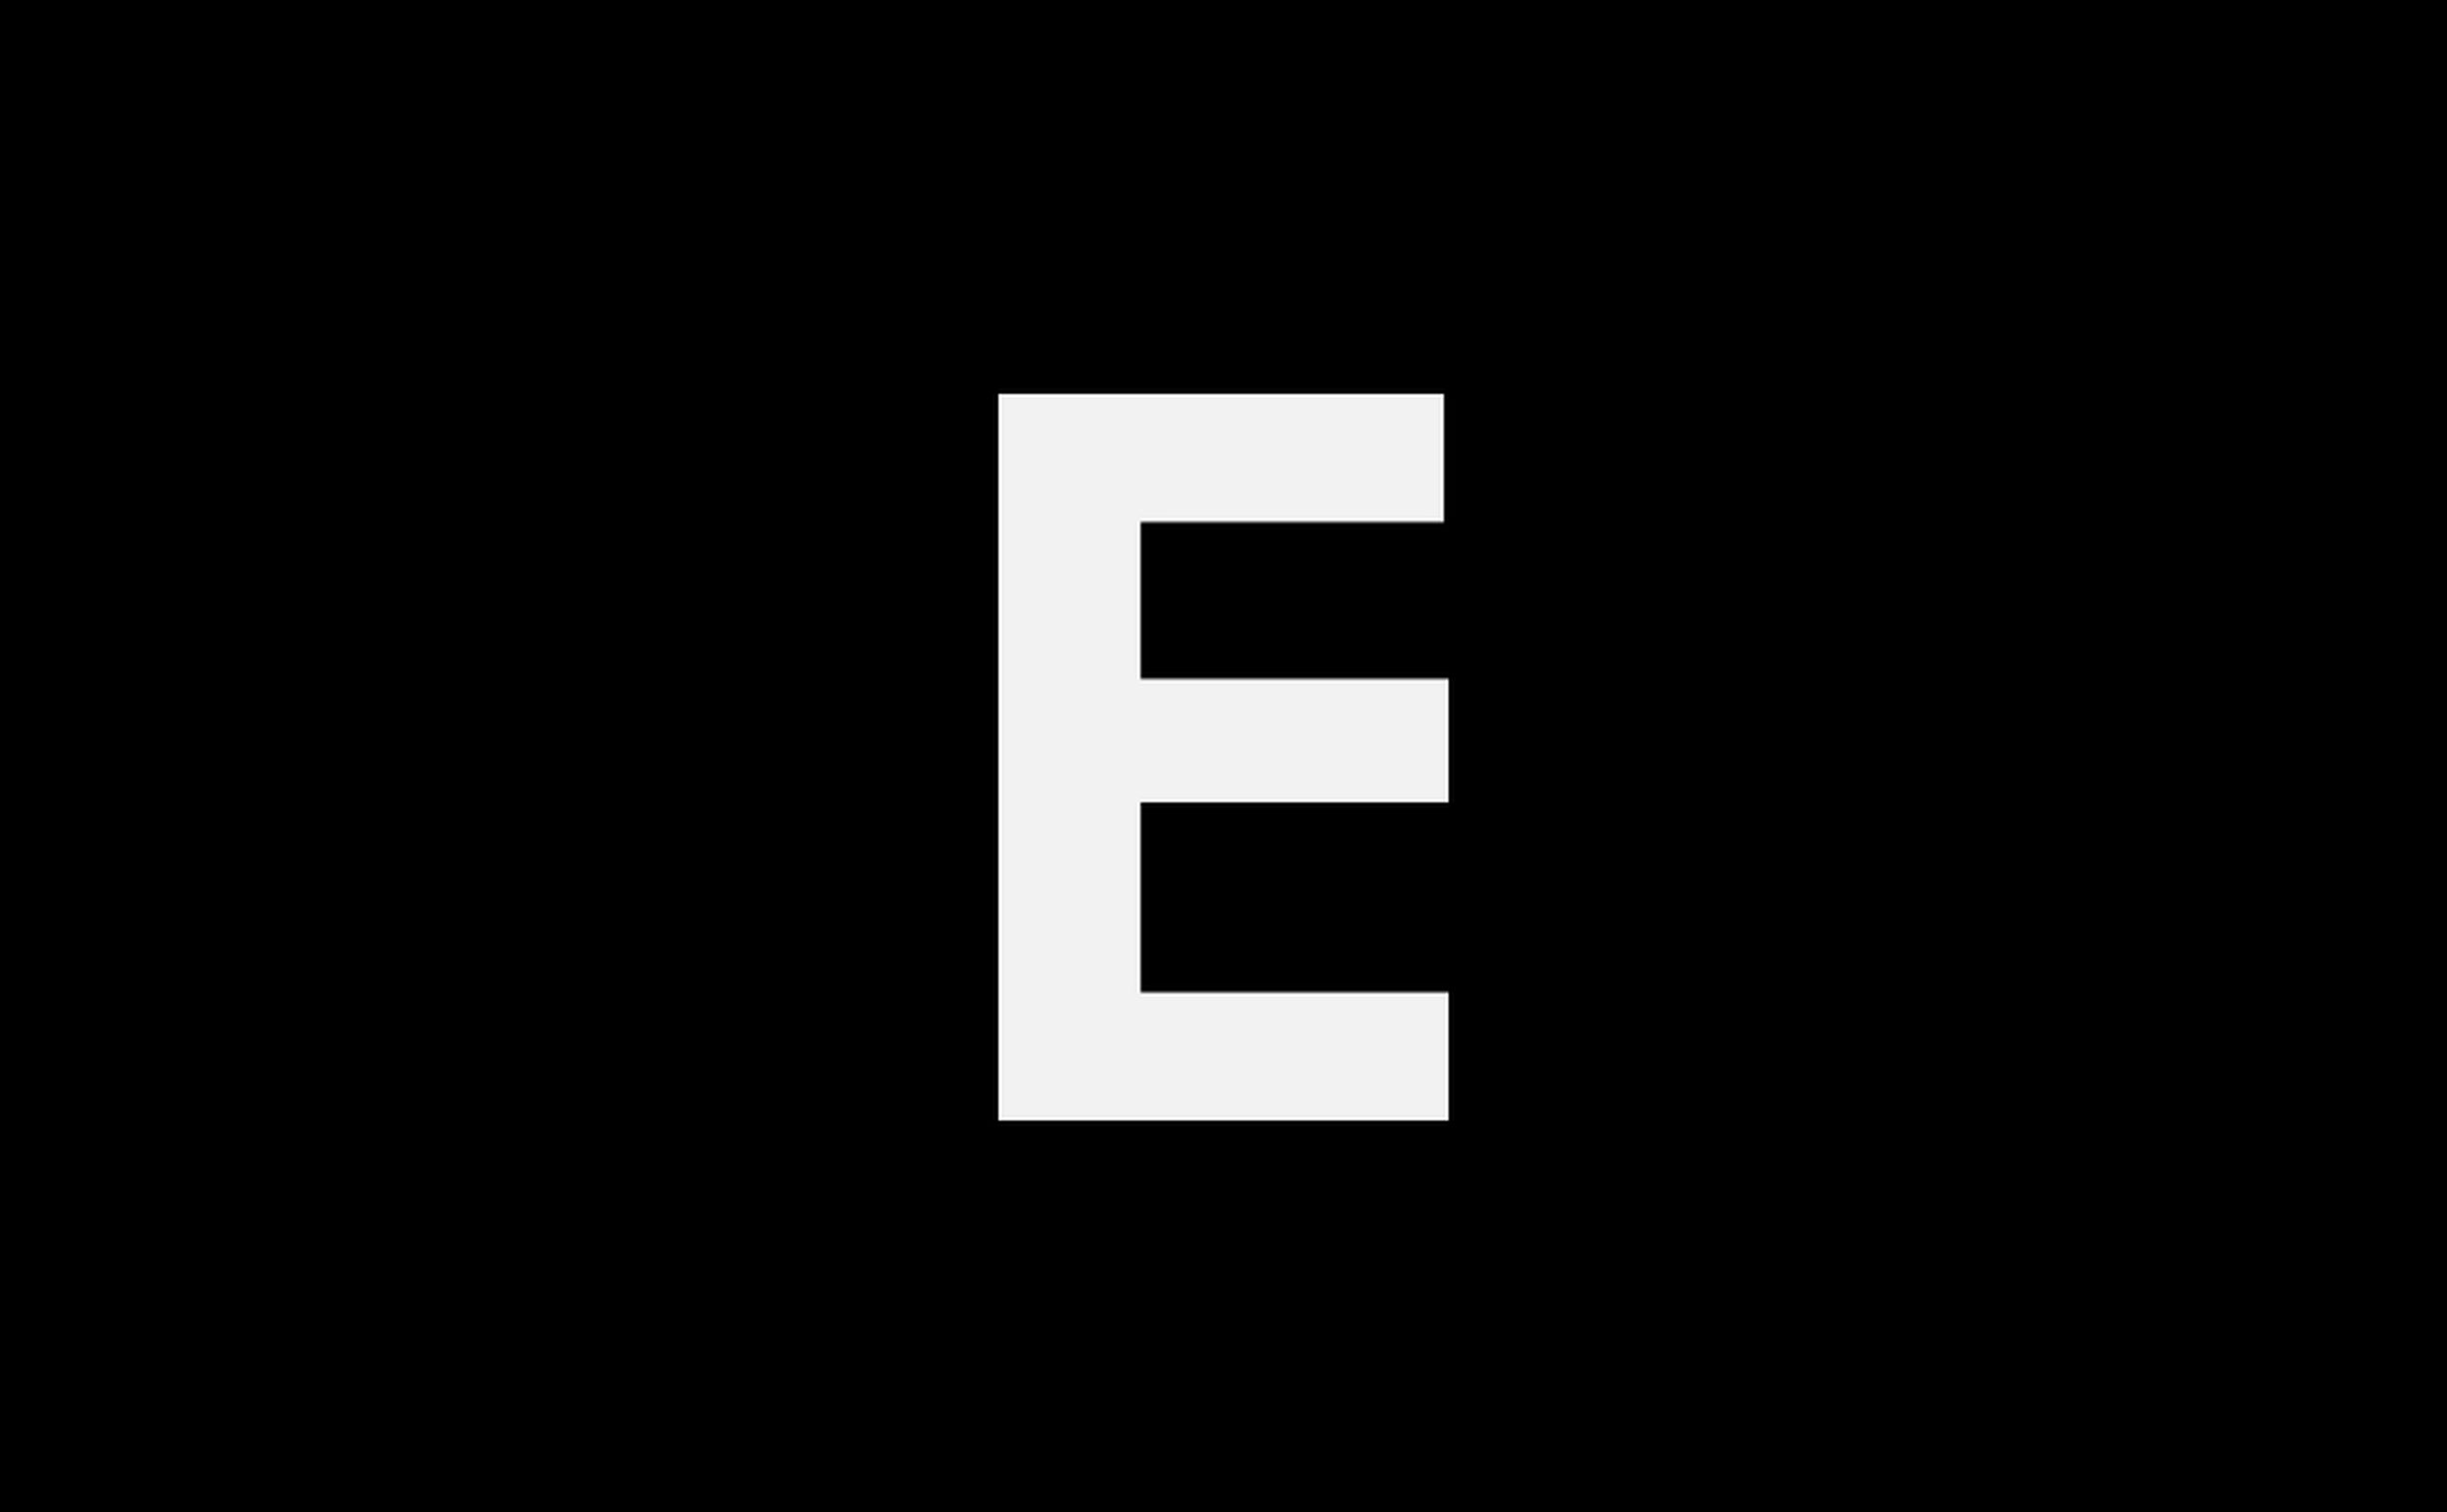 Pallets Wood Warehouse Shipping  Warehouse Life Warehousephotography